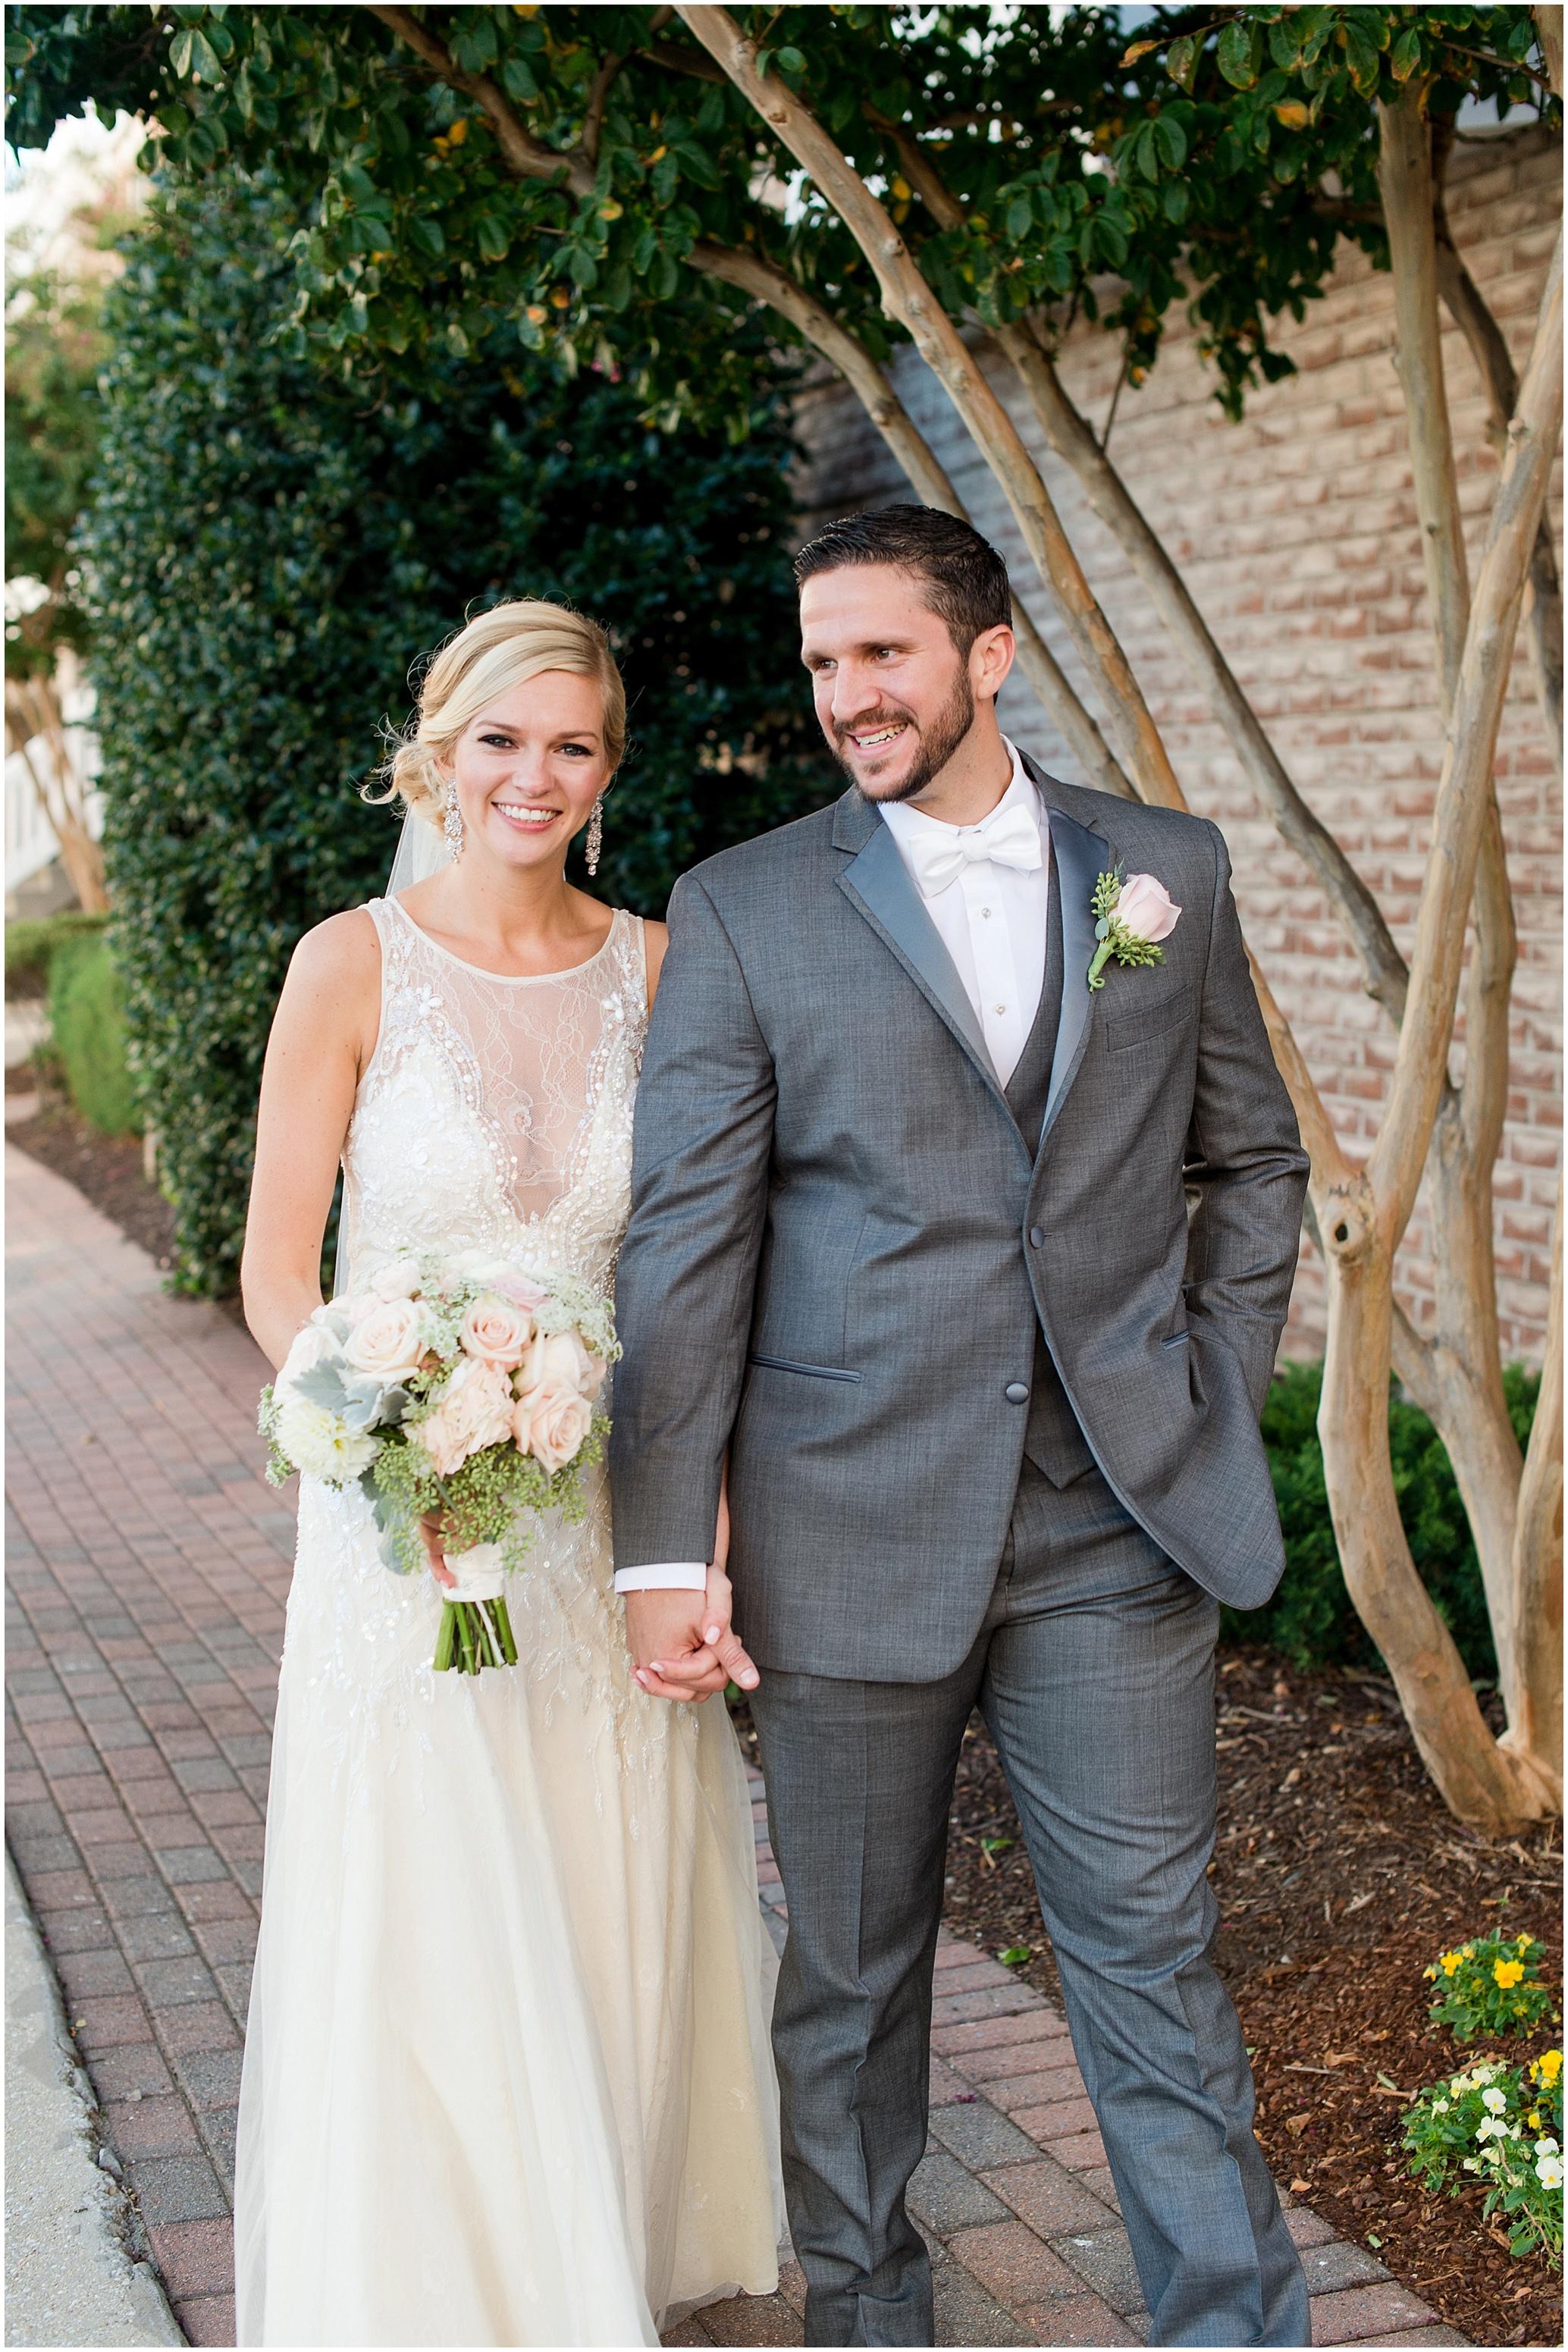 Hannah Leigh Photography Tabrizis Baltimore Wedding_2214.jpg